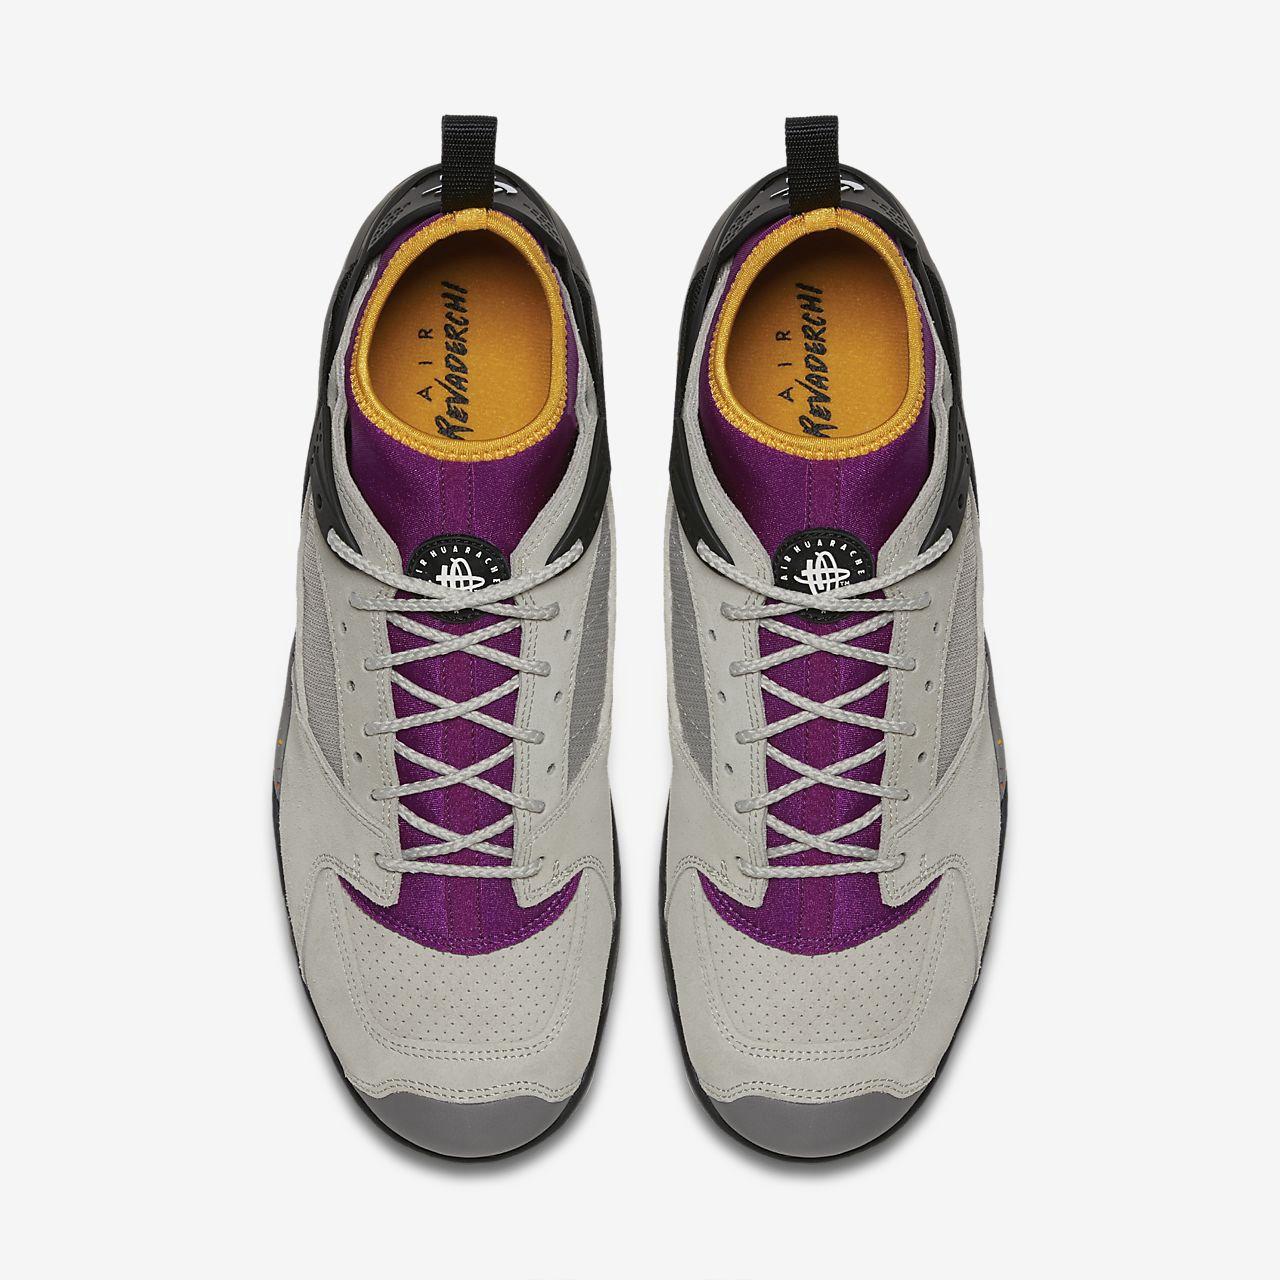 best service 3aad4 2e9e8 Nike Acg Air Revaderchi Men s Shoe - 10.5